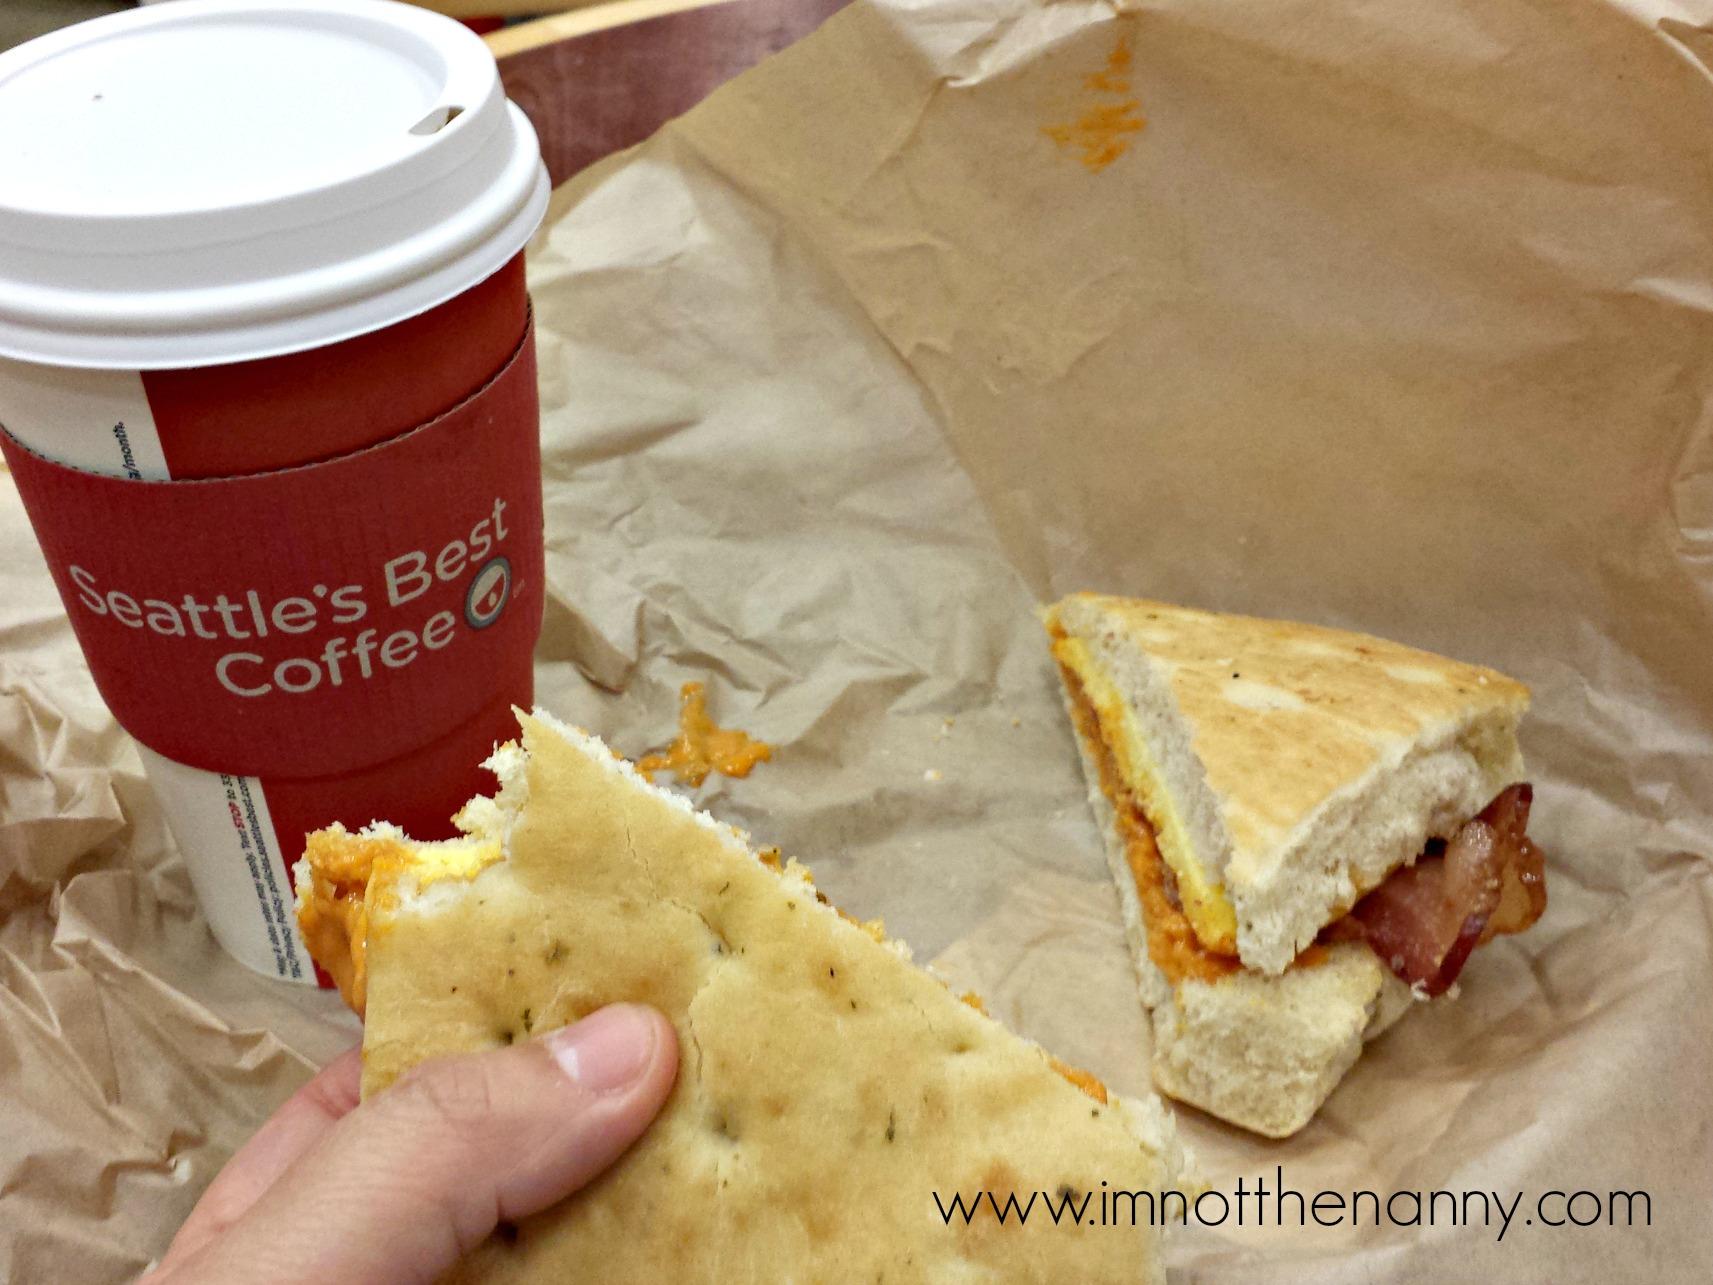 Breakfast with Seattles Best at #Rubi2Go #shop #cbias